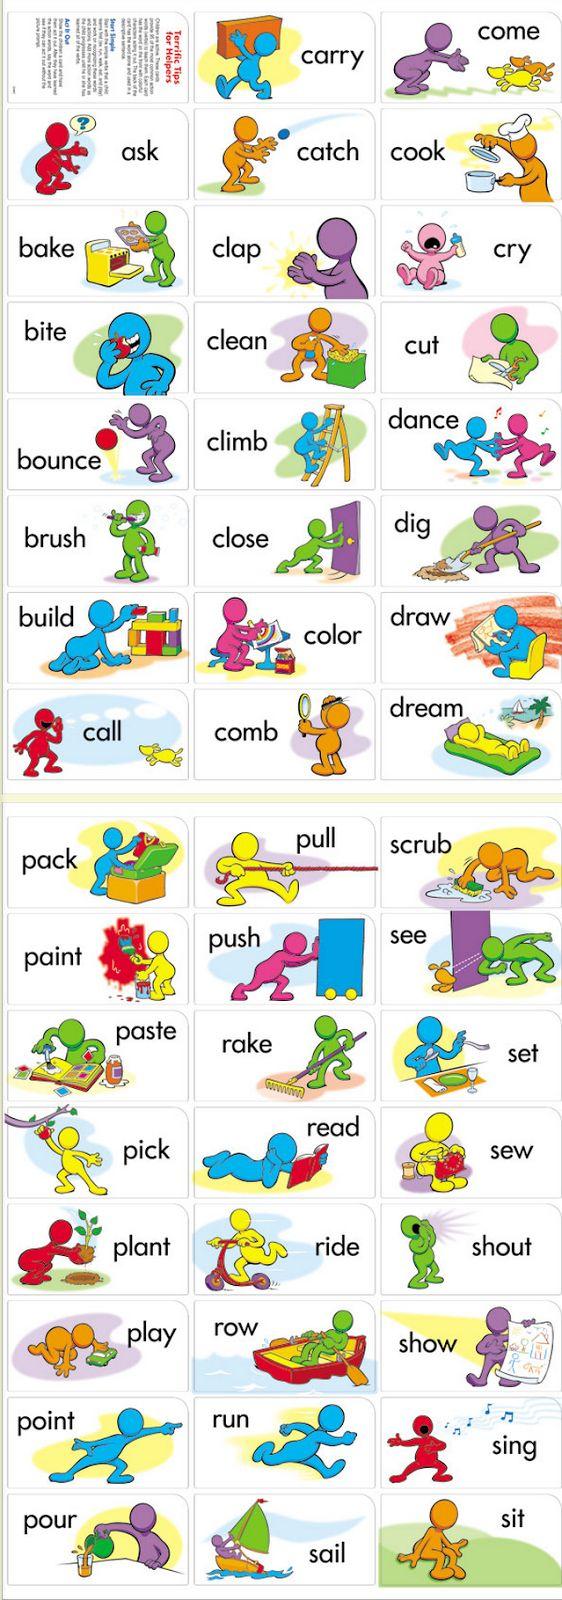 vocab-verbs